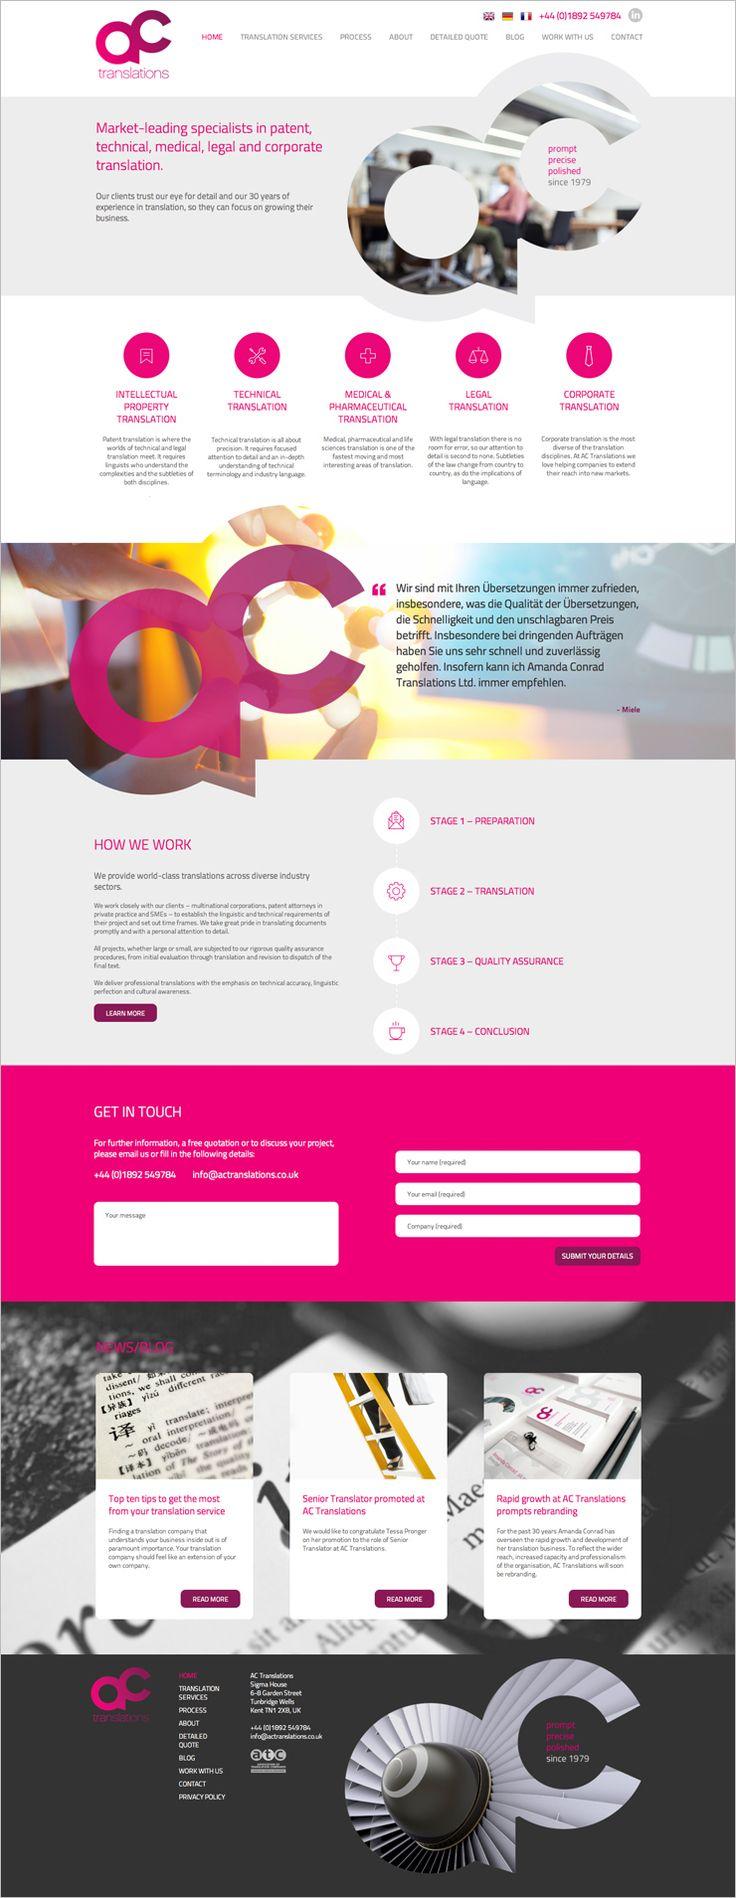 Cool Web Design, ac translations. #webdesign #webdevelopment [http://www.pinterest.com/alfredchong/]